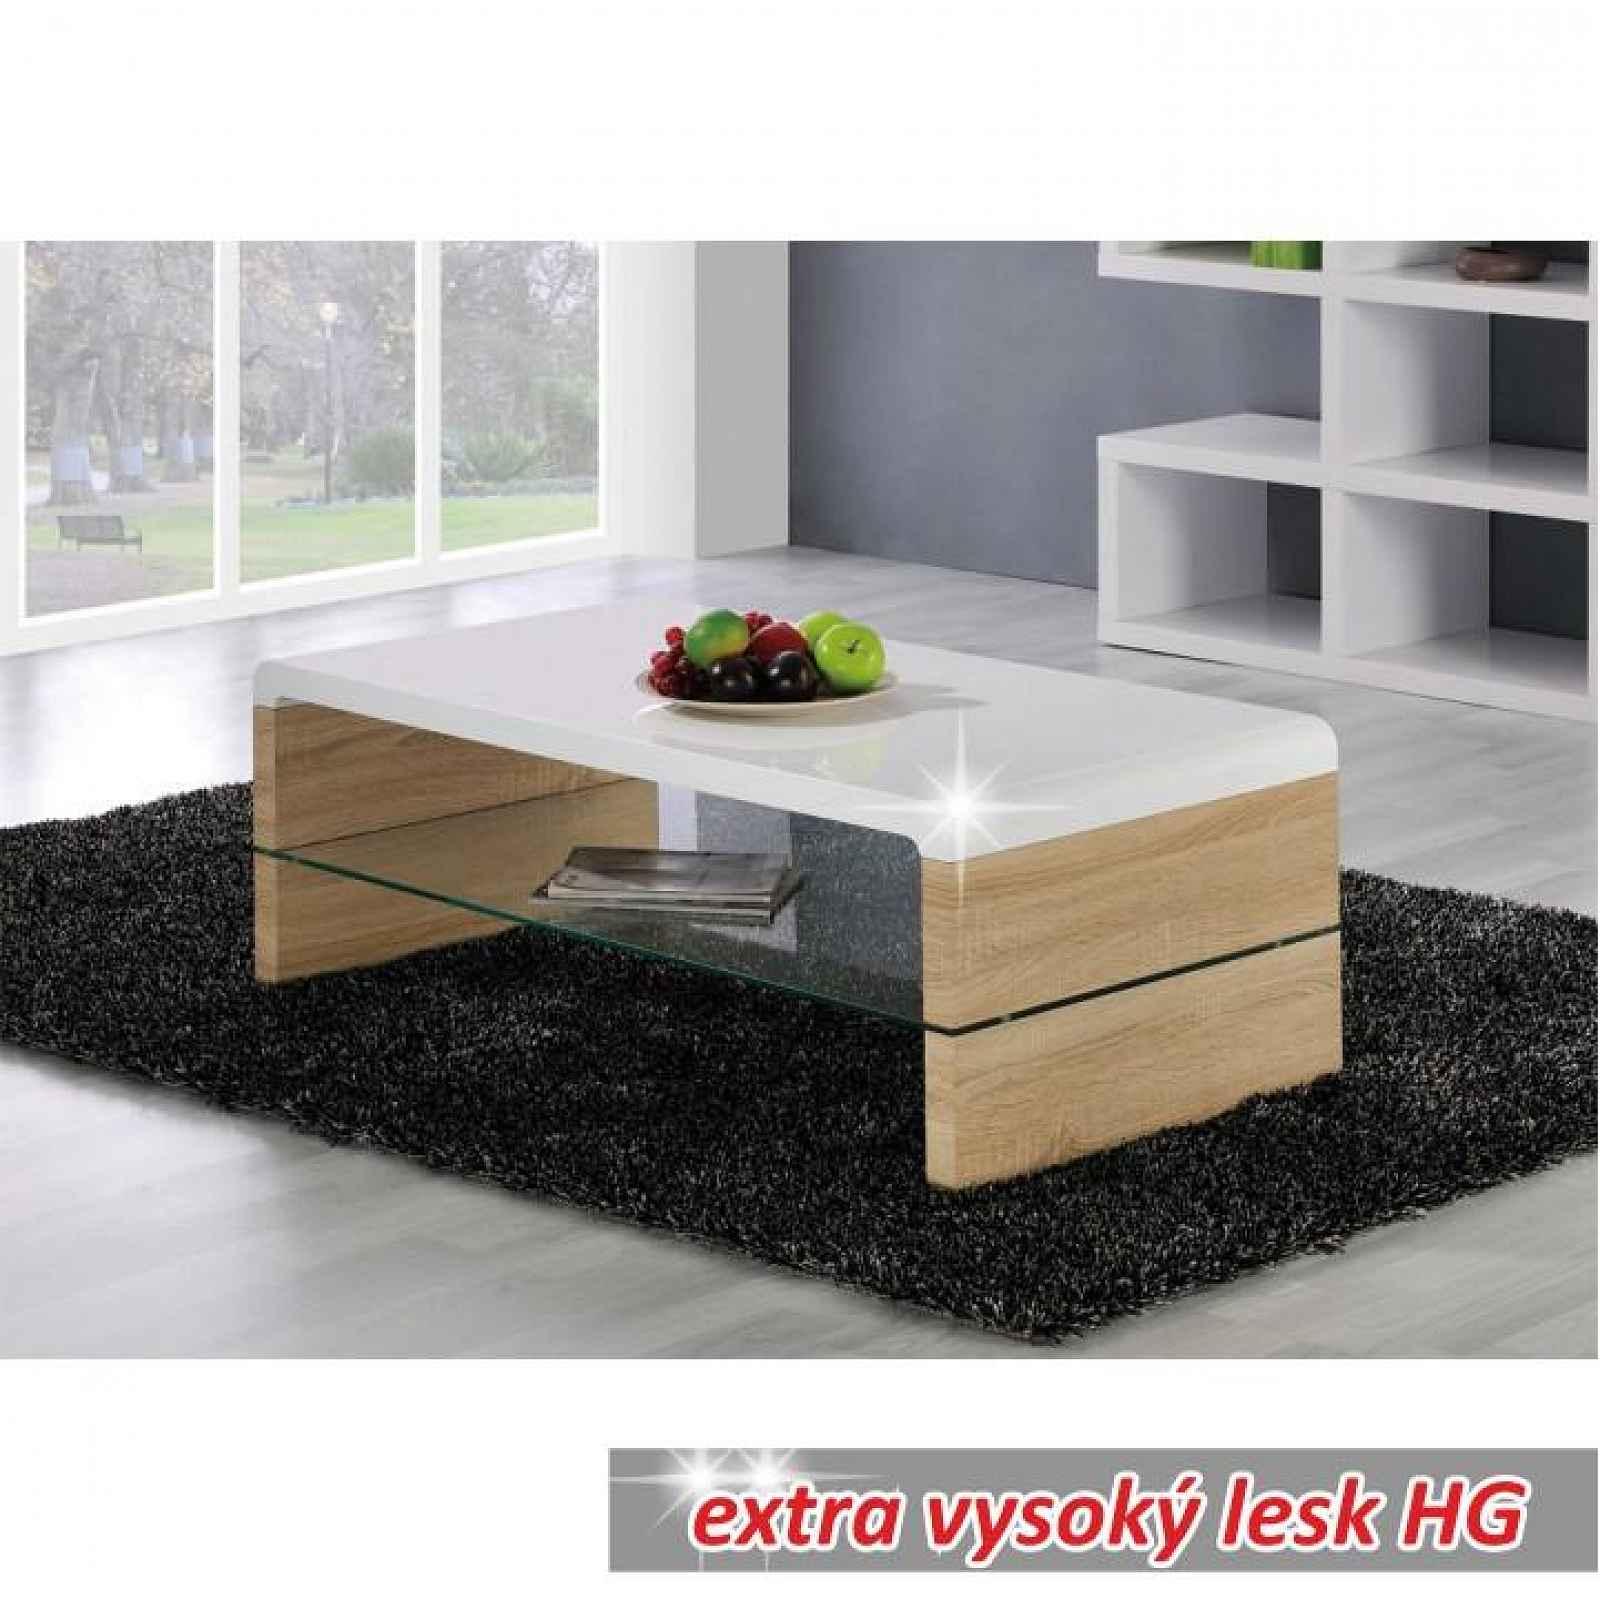 Konferenční stolek, dub sonoma / bílá extra vysoký lesk HG, KONTEX 2 NEW 0000188124 Tempo Kondela